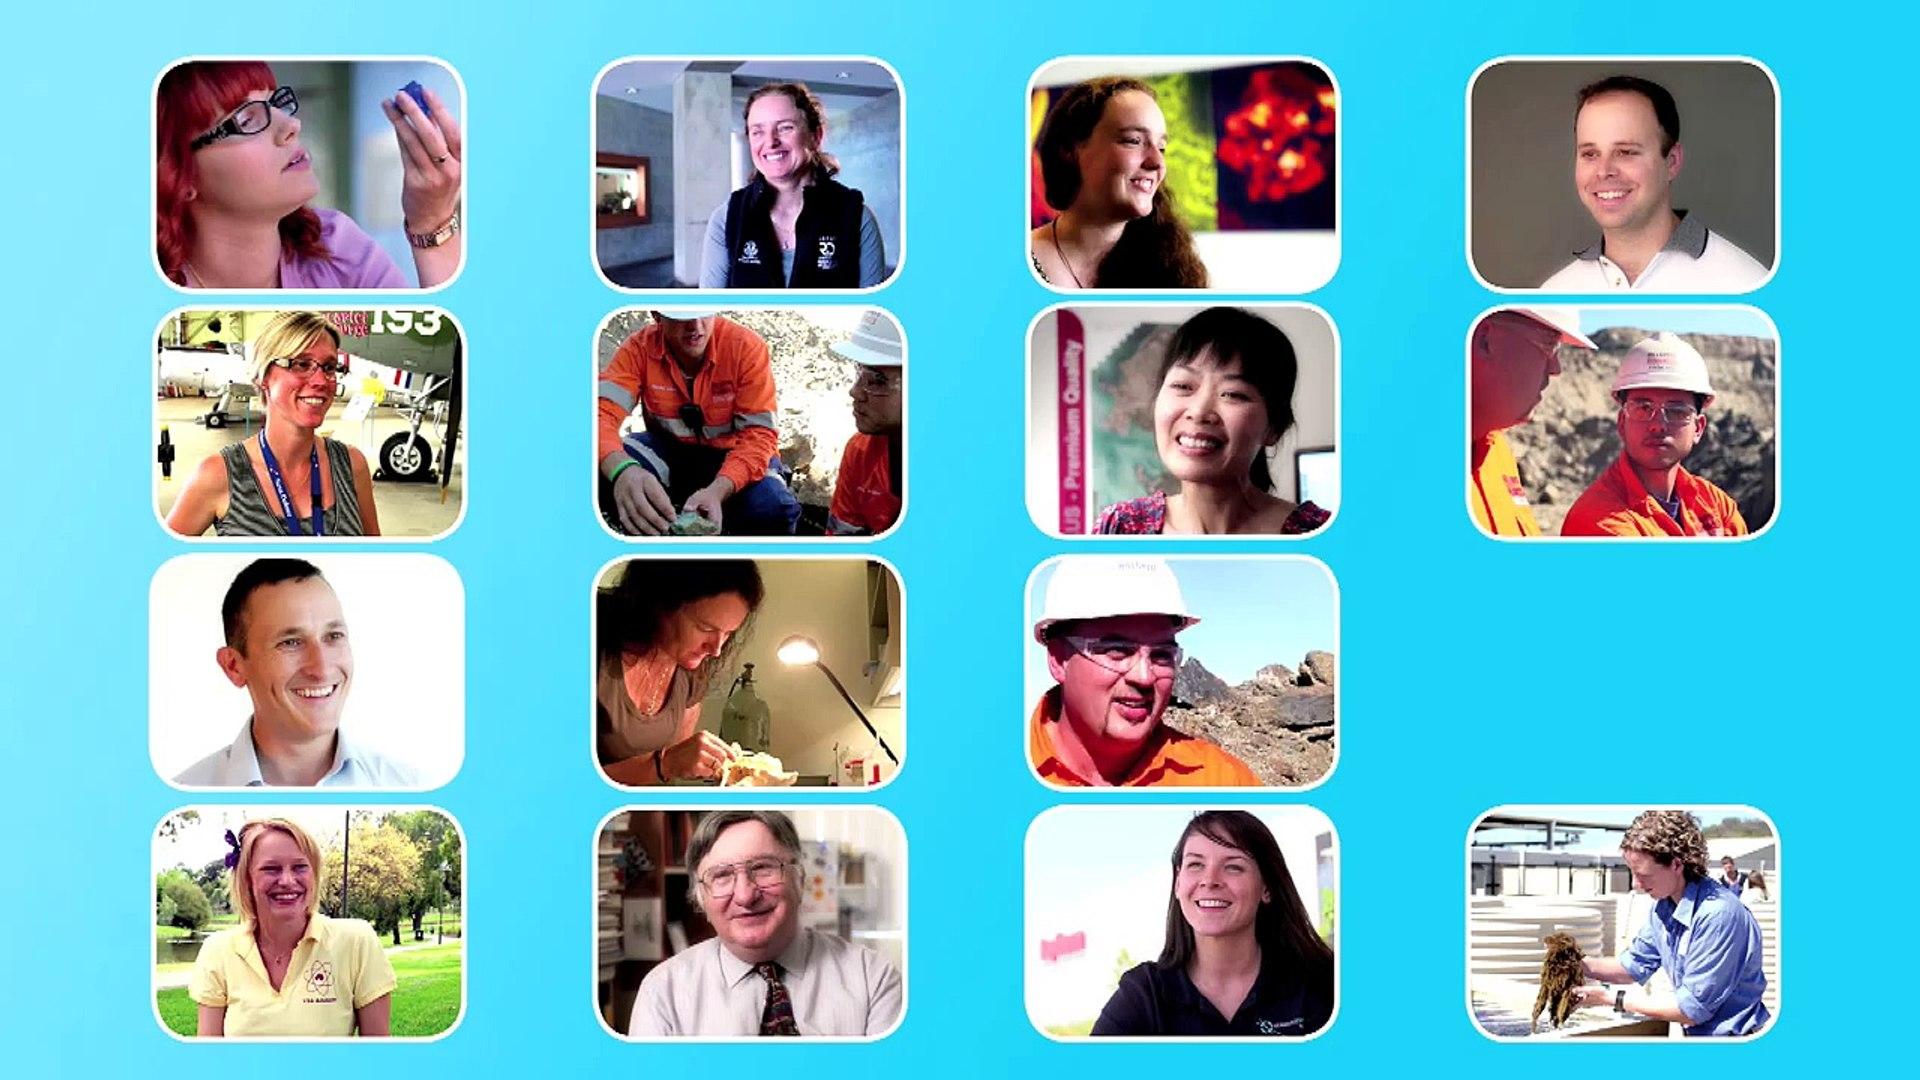 Bringing Science to Life: Science heroes